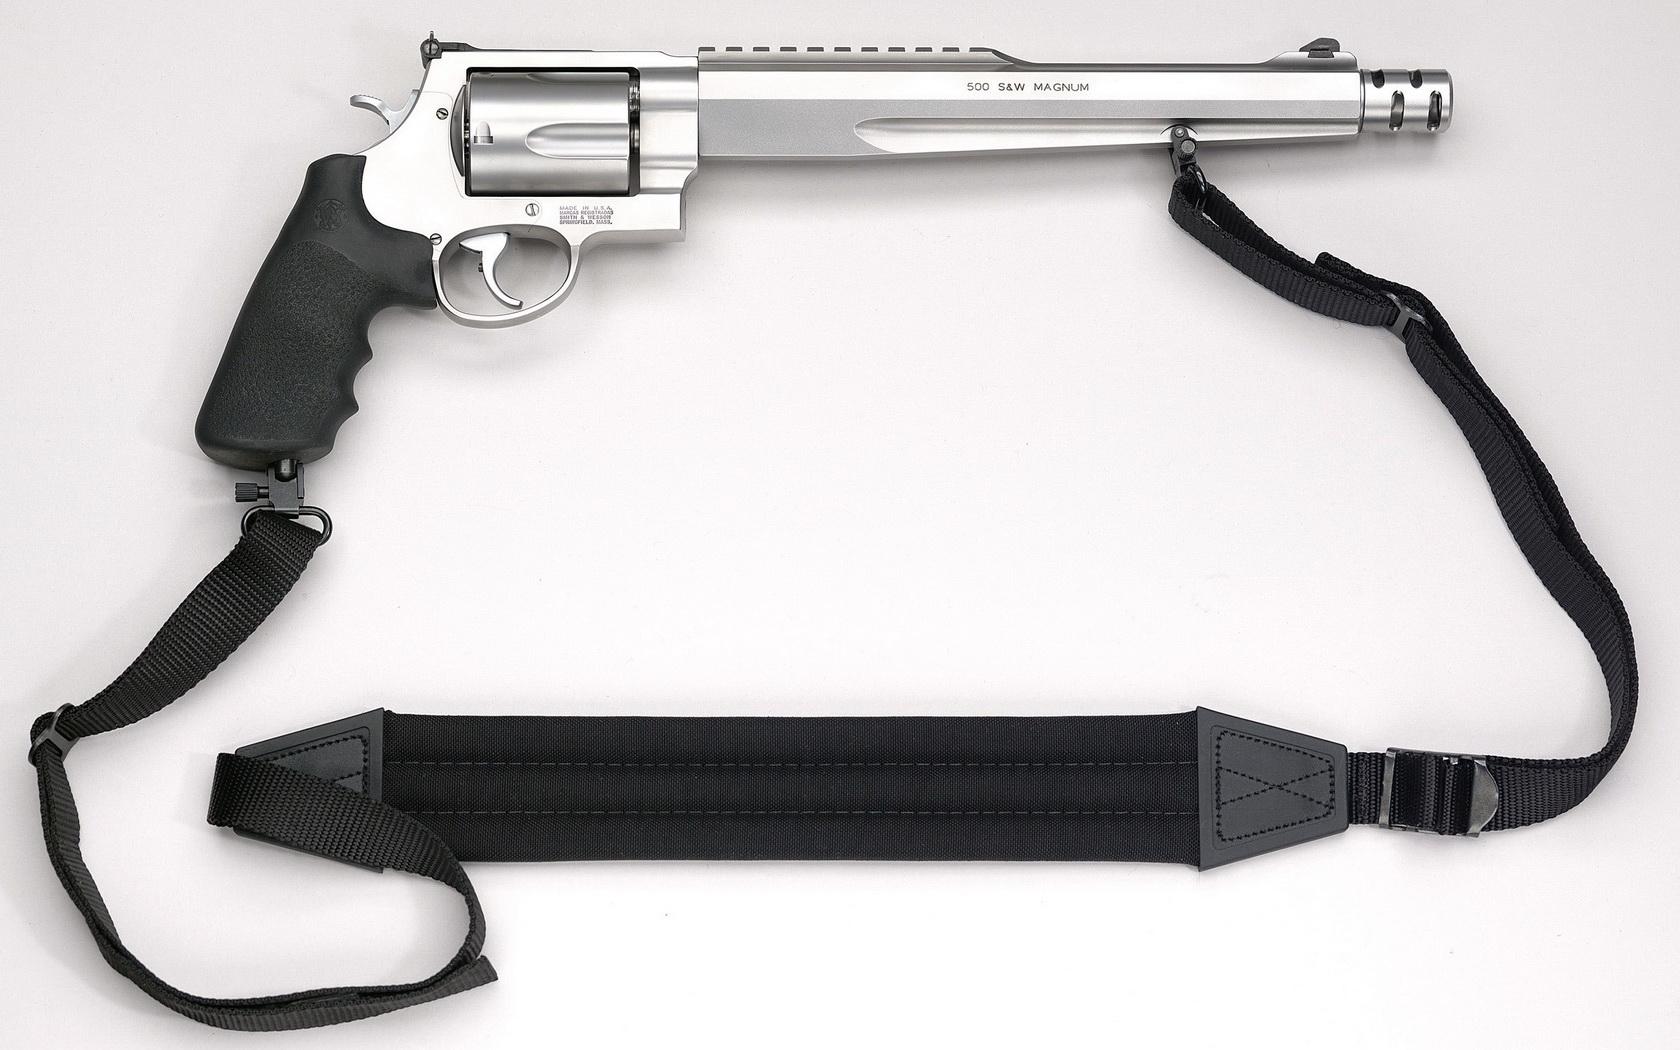 Smyth & Wesson Magnum - 1680x1050